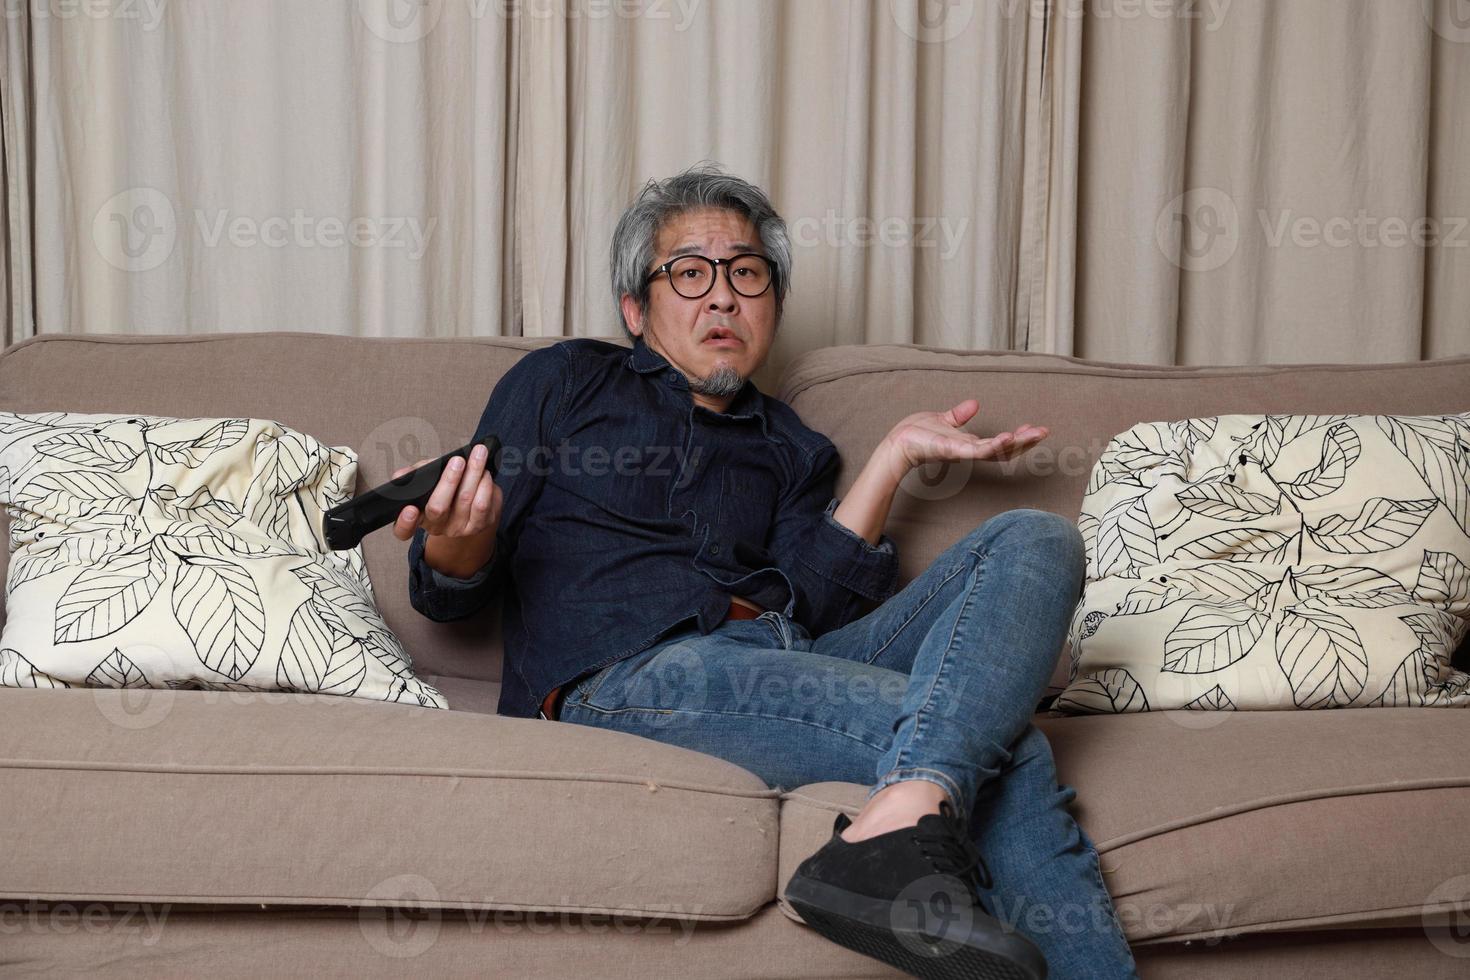 en la sala de estar foto